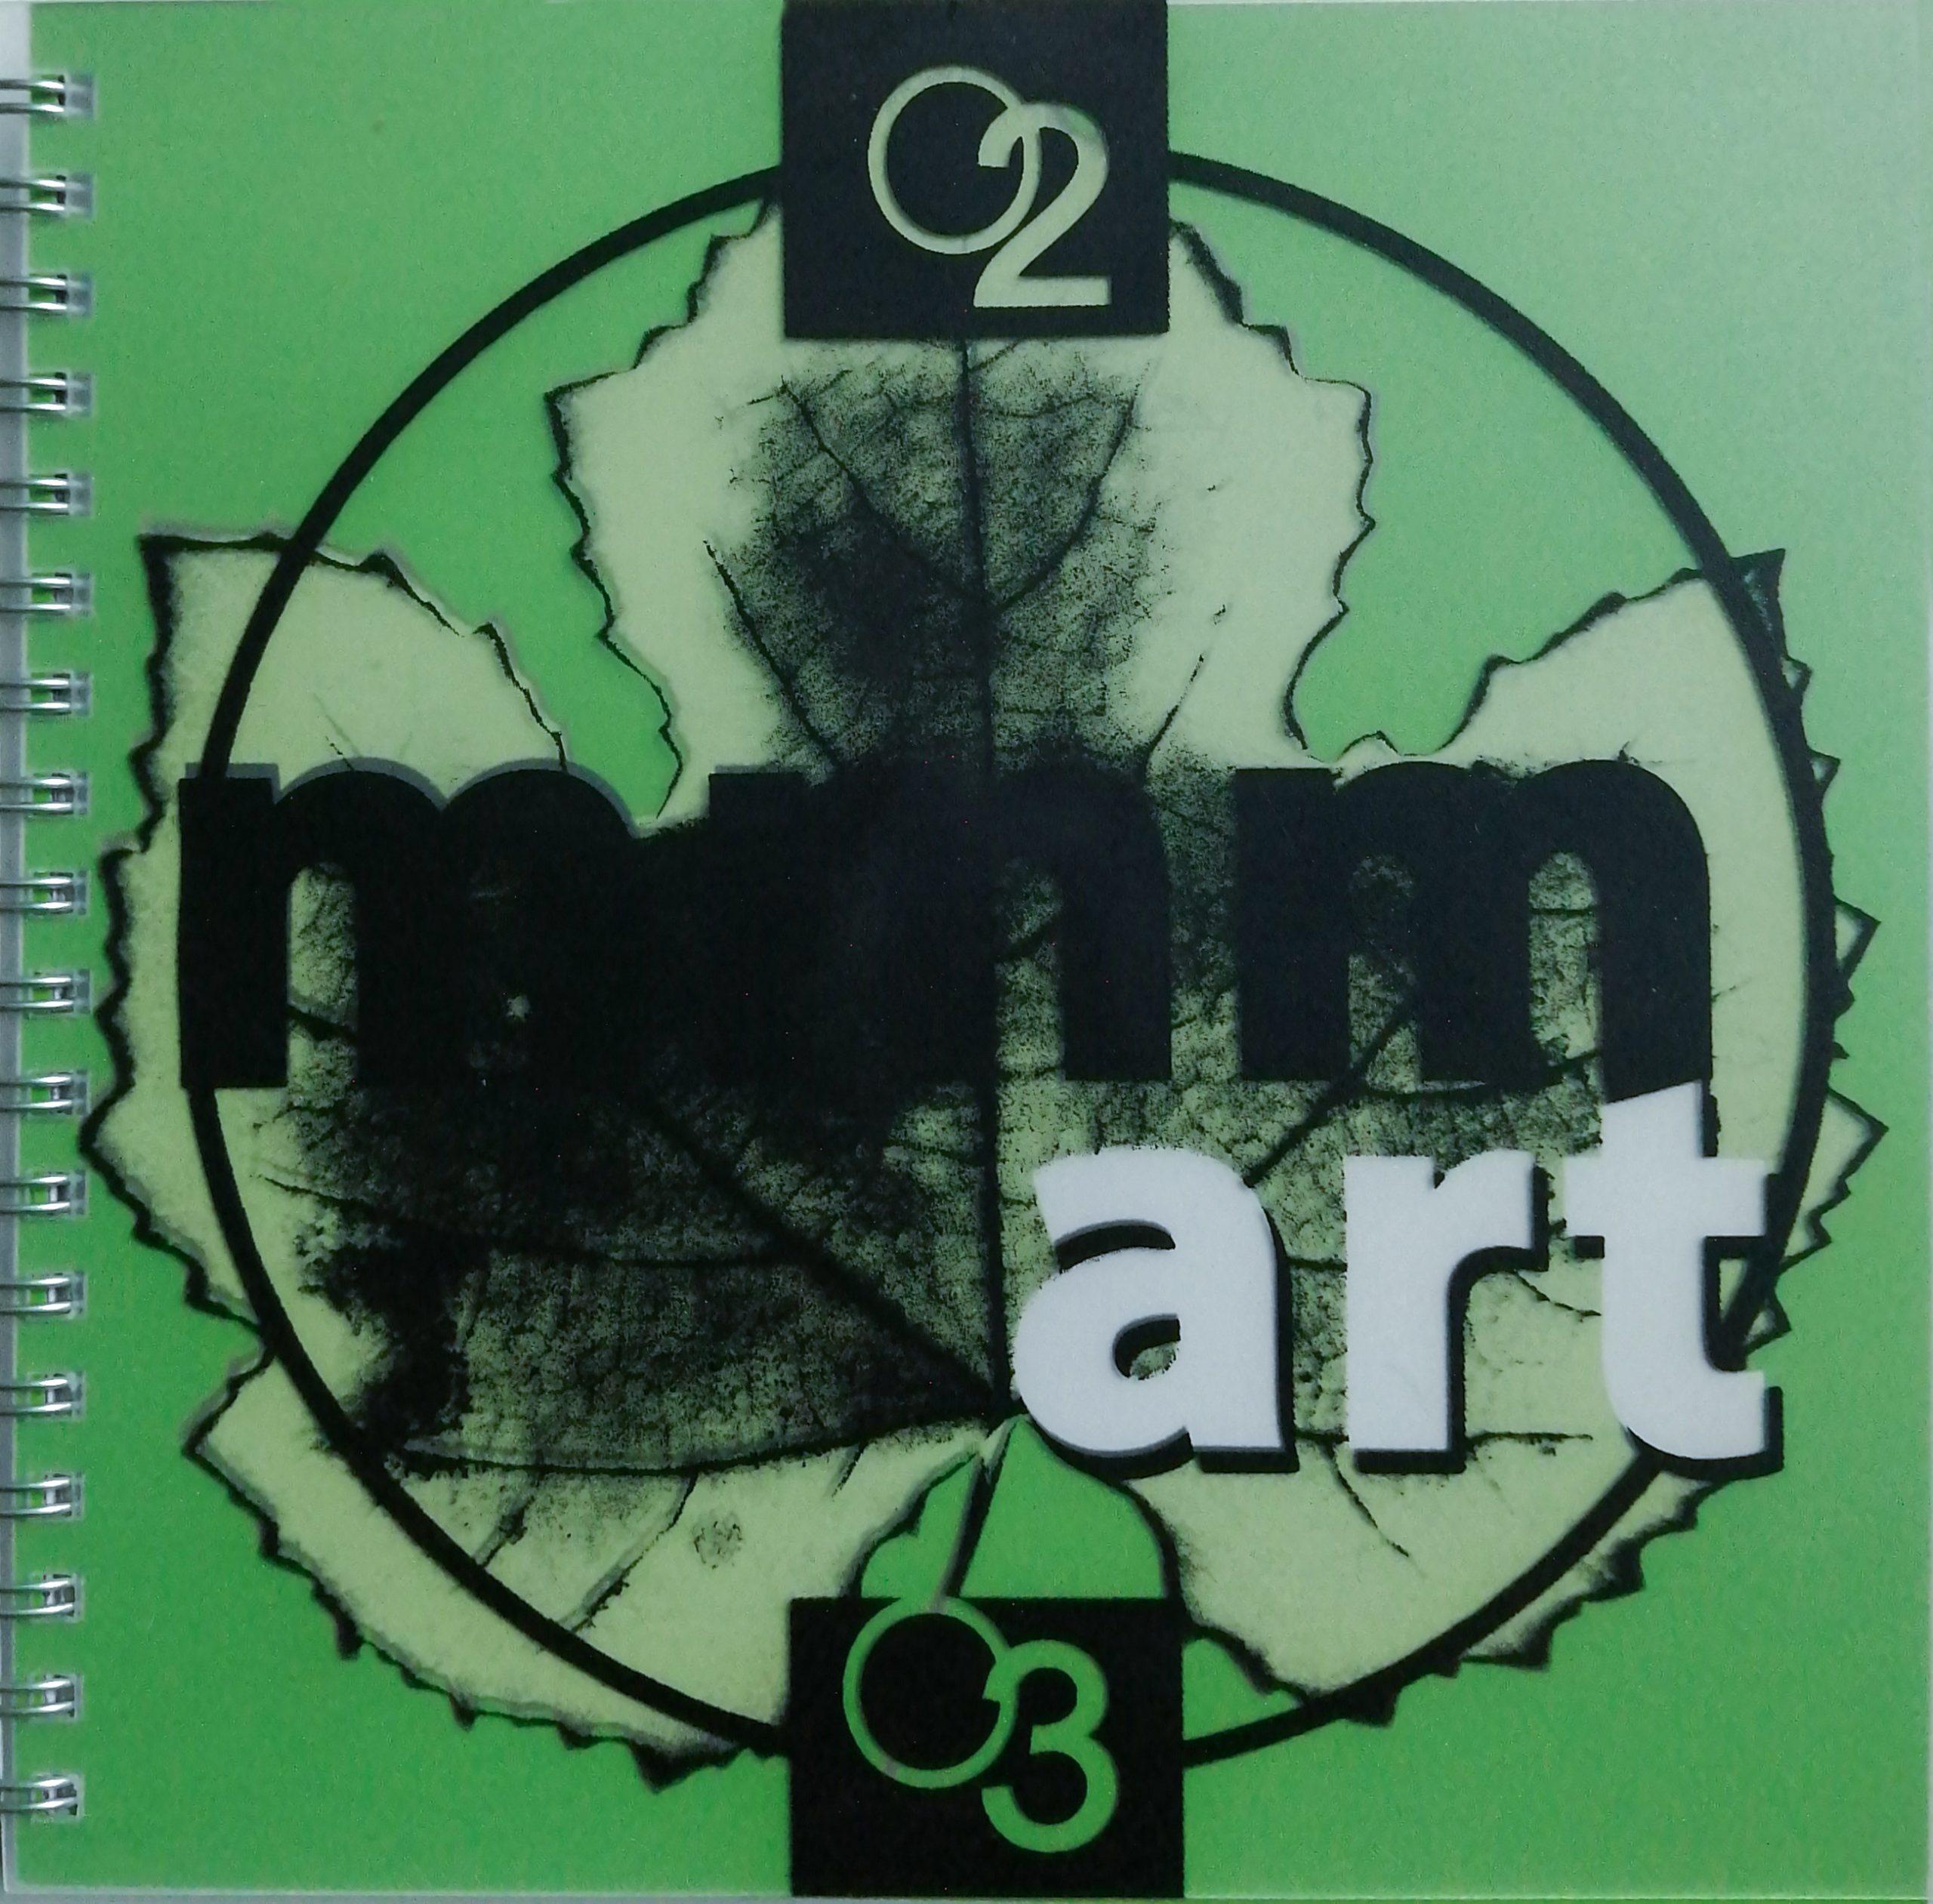 2003 MMM Art Medana Slovenjia scaled - Bibliography/ Catalogues